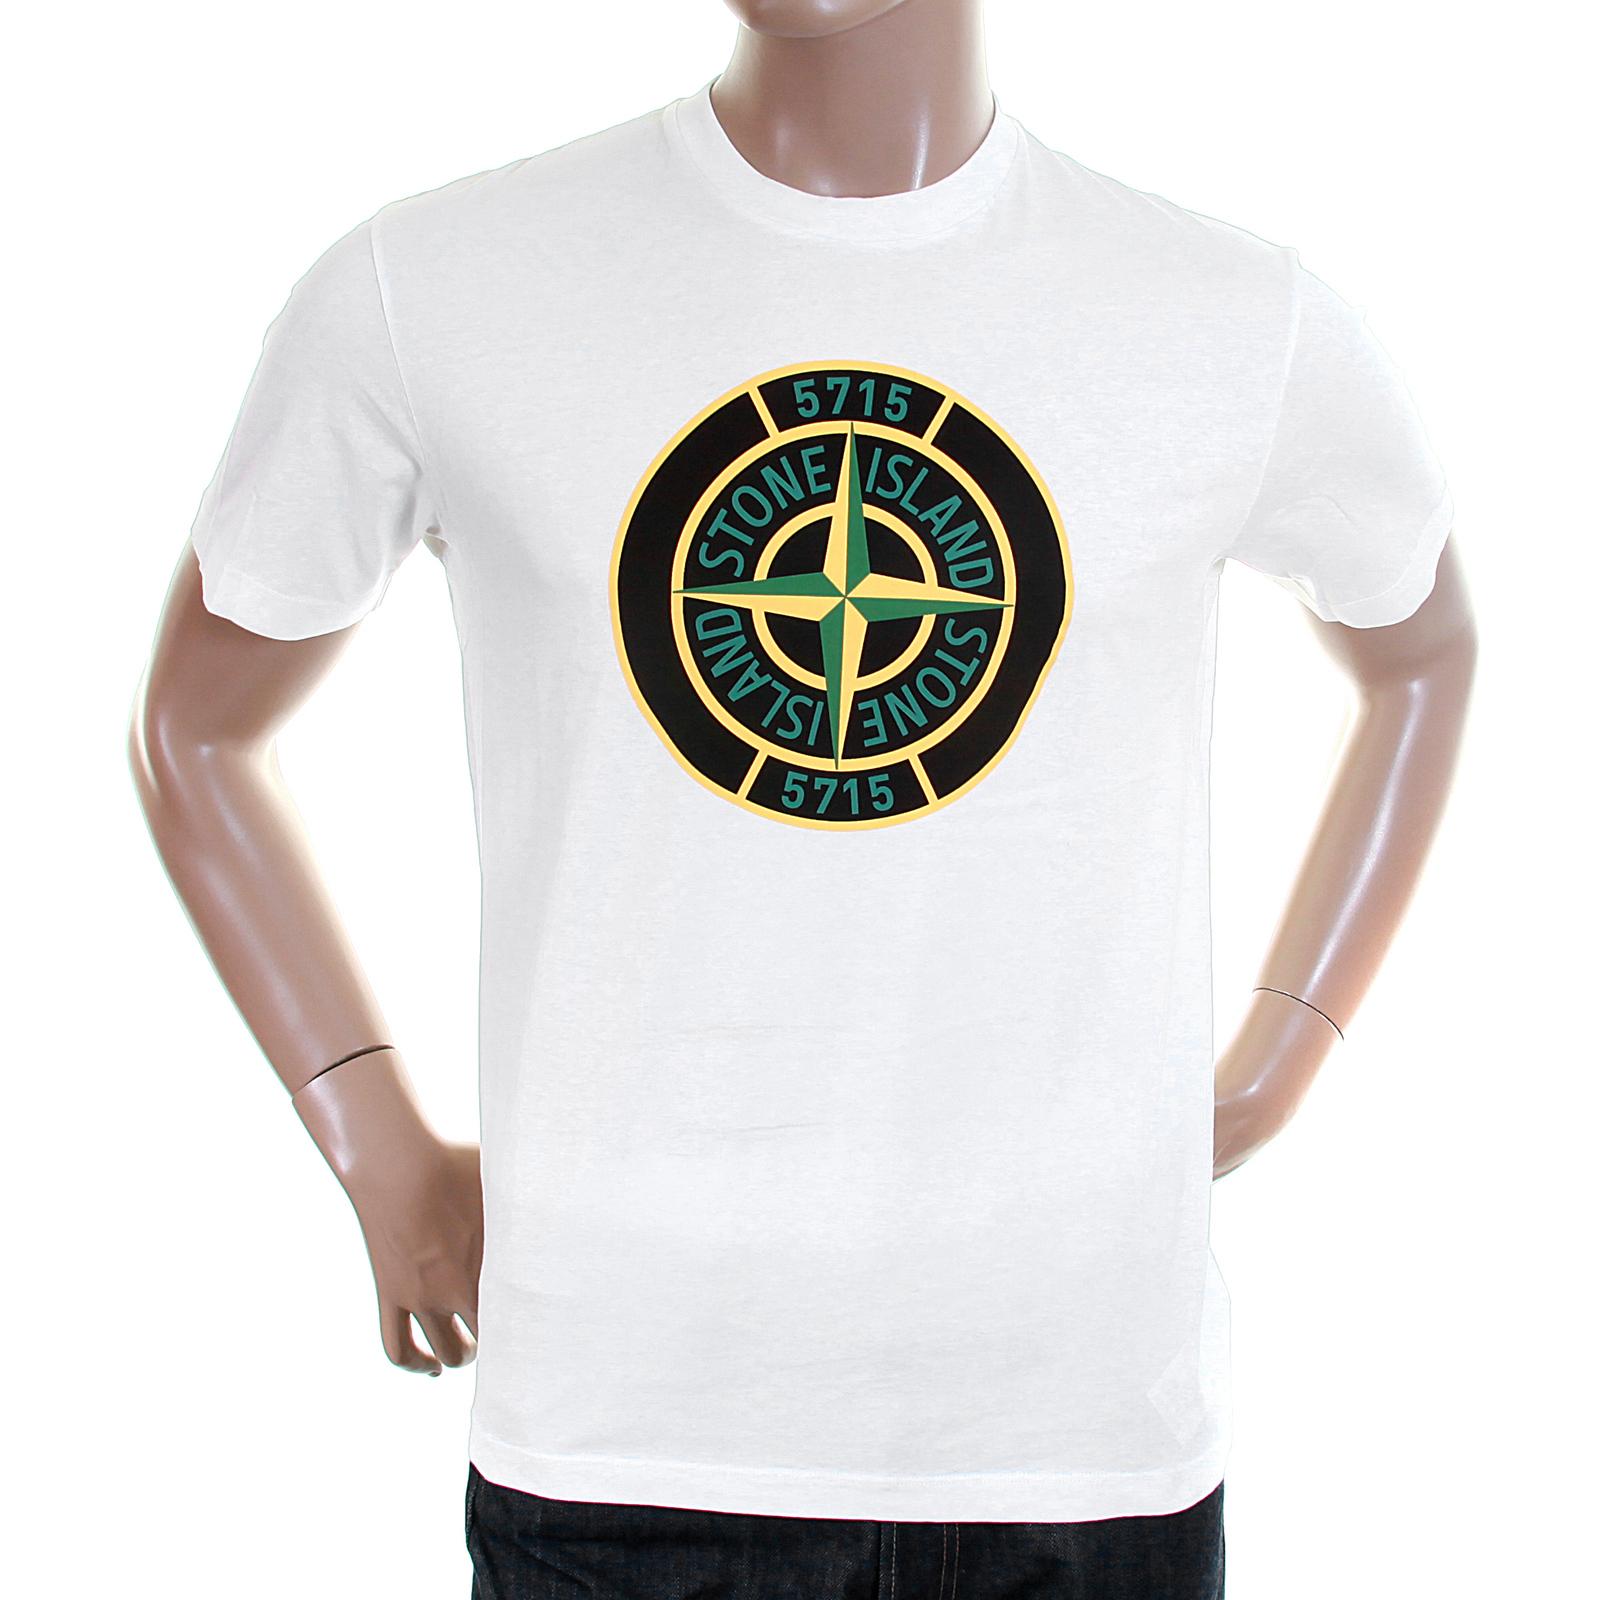 Stone island mens natural 561520181 compass logo tee shirt for My logo on a shirt